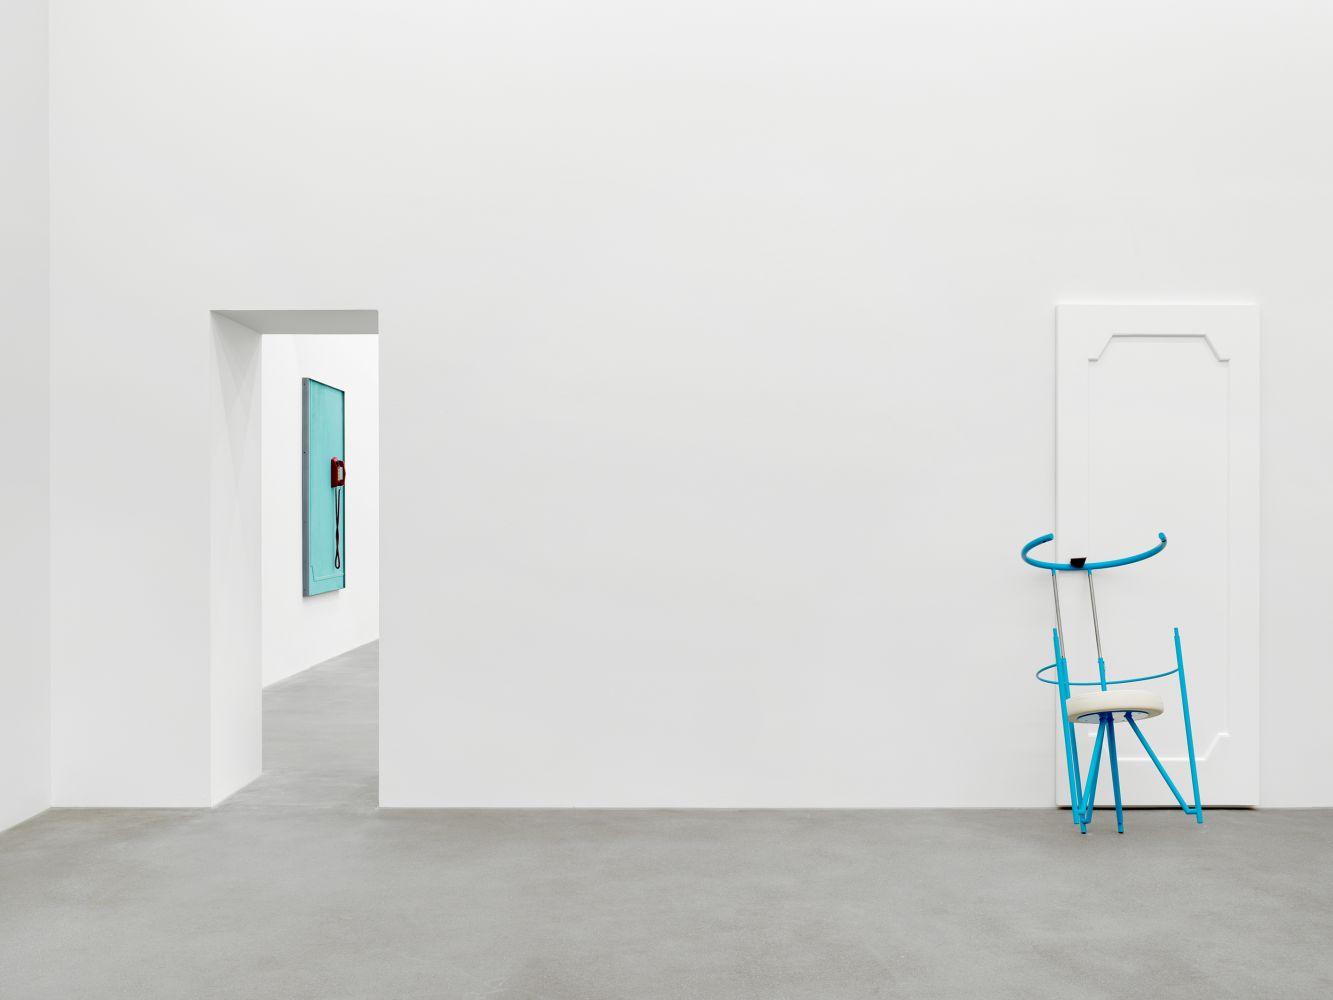 Exhibition View, Martin Boyce, No Longer Fathom, Galerie Eva Presenhuber, Zurich 2020 install 4